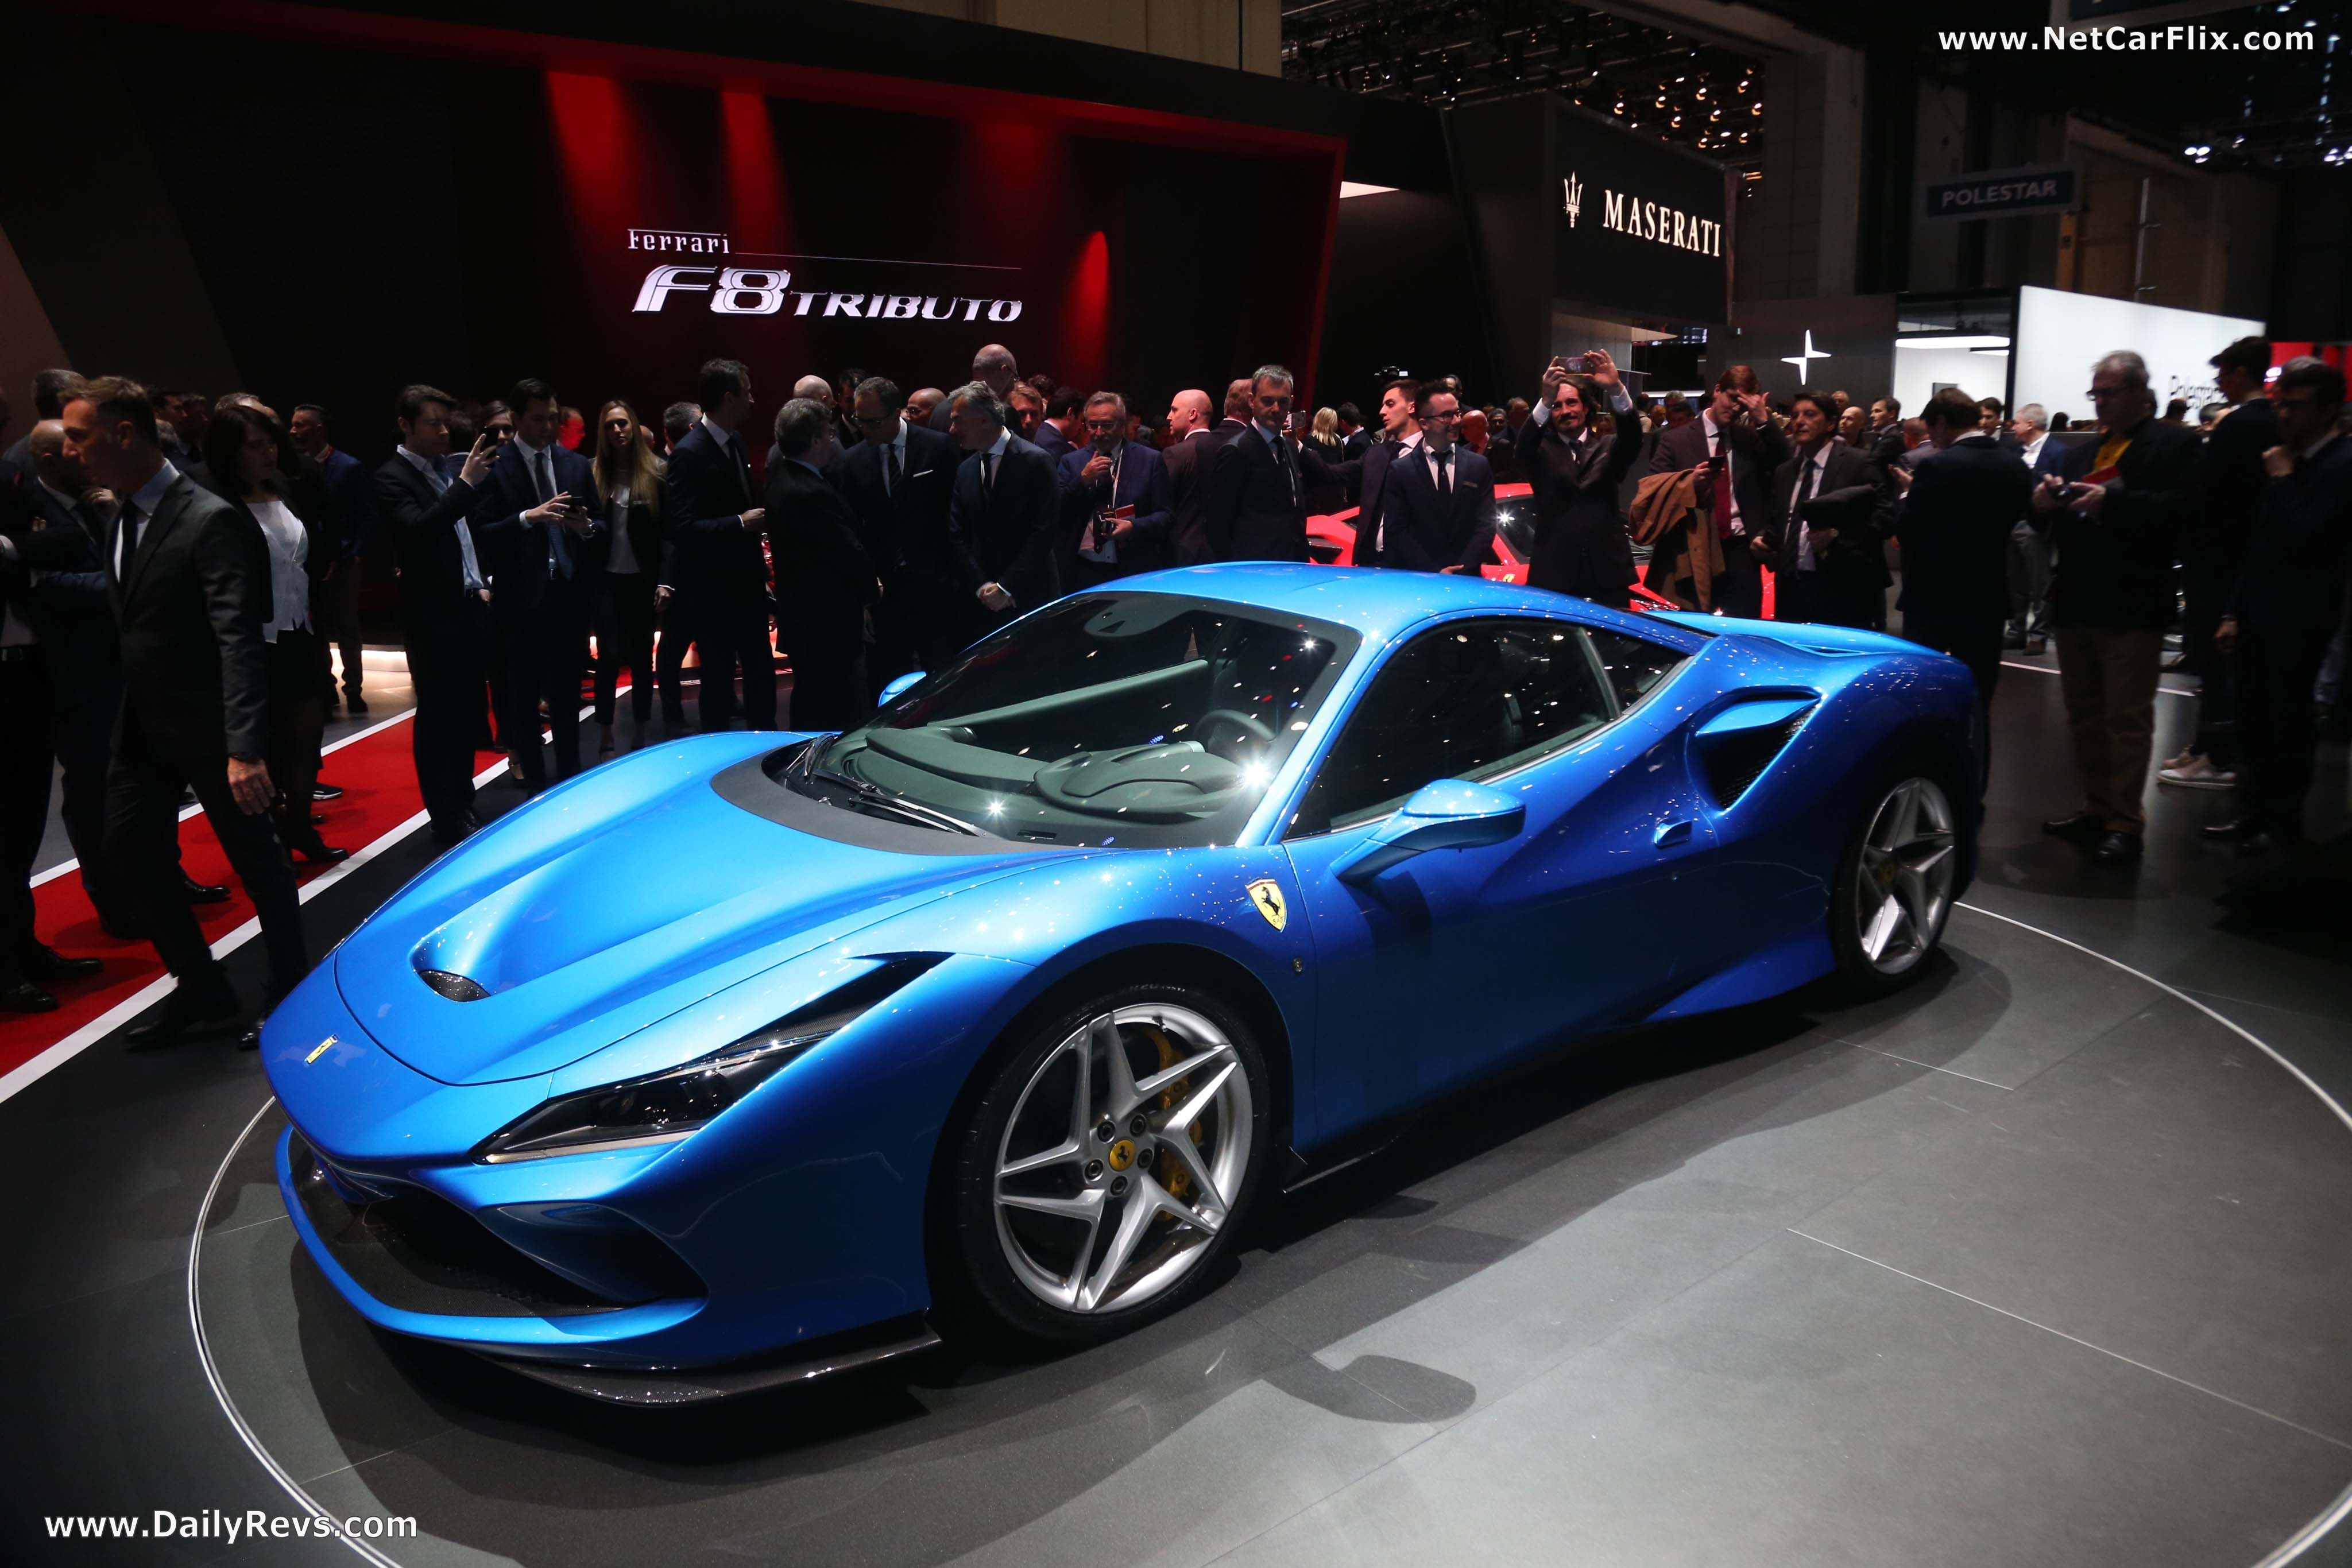 2020 Ferrari F8 Tributo Hd Pictures Videos Specs Information Dailyrevs Car Exterior Ferrari Maranello